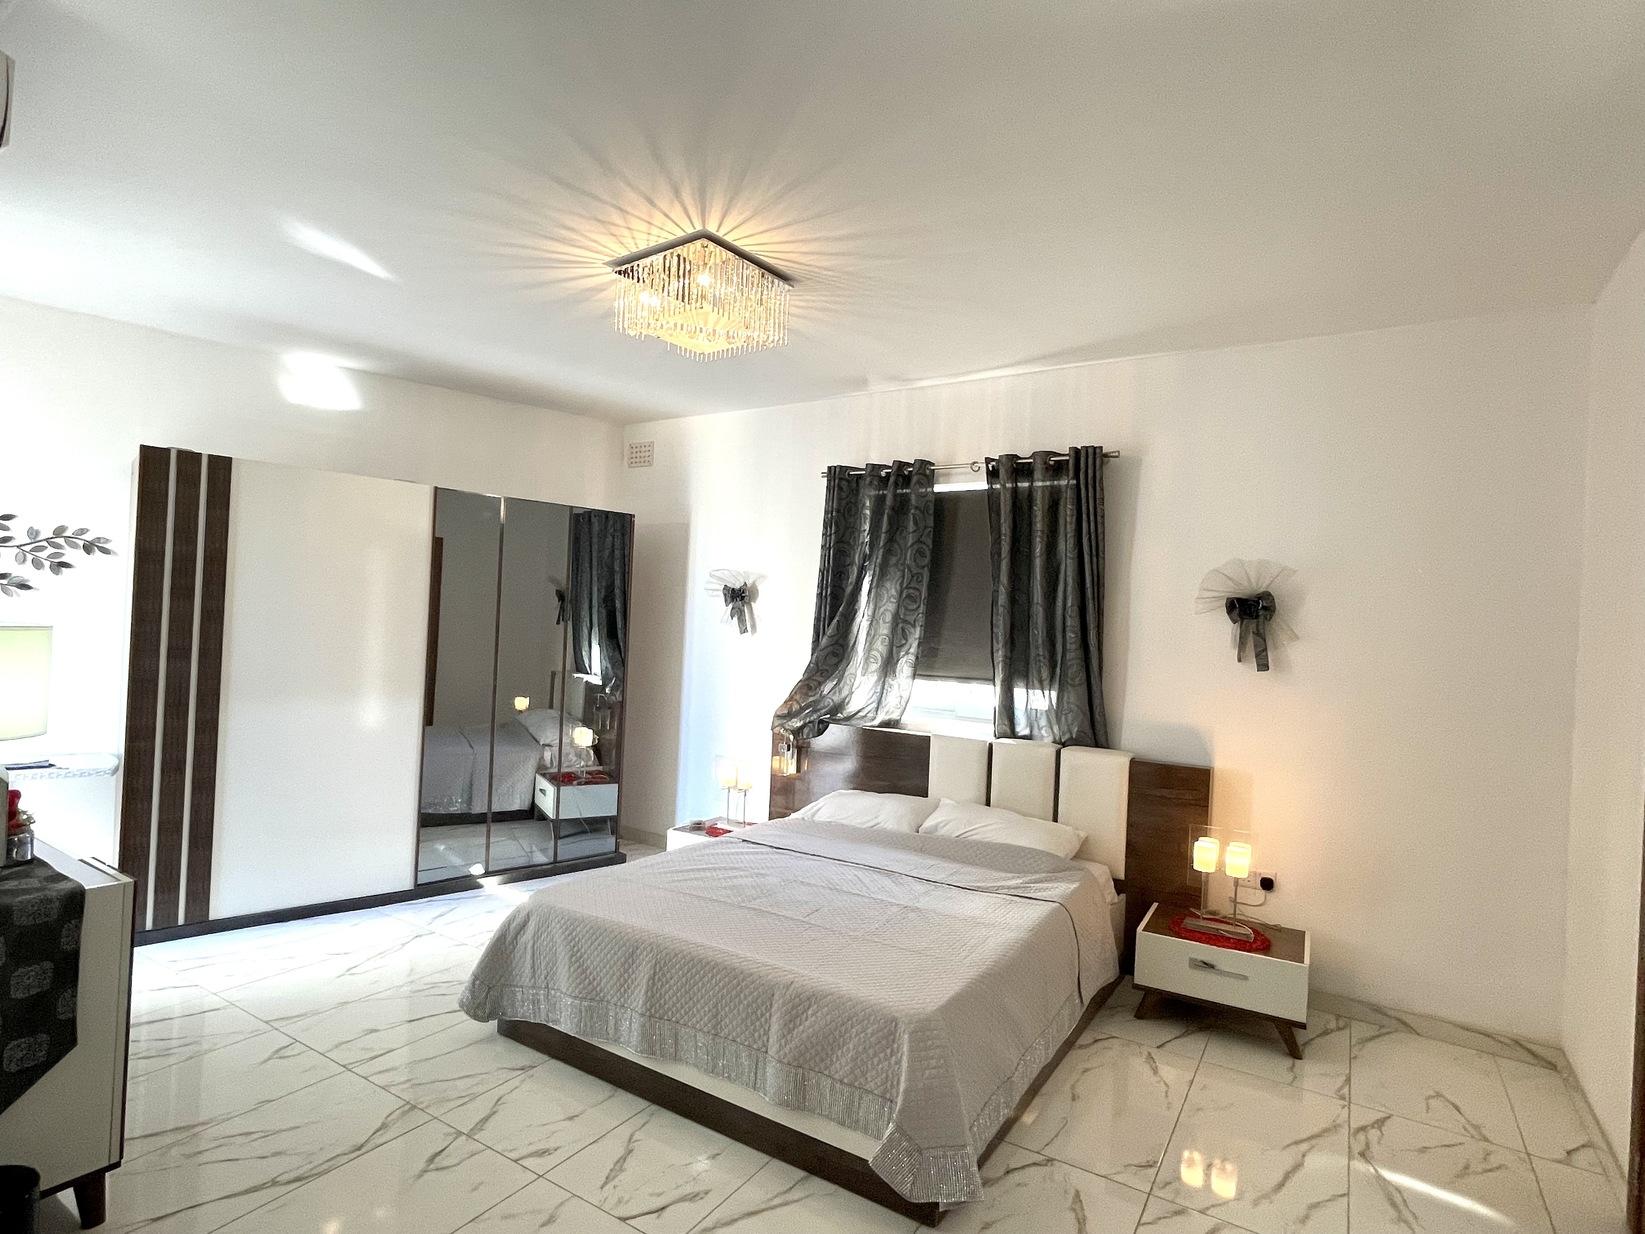 4 bed Penthouse For Rent in Marsaxlokk, Marsaxlokk - thumb 9